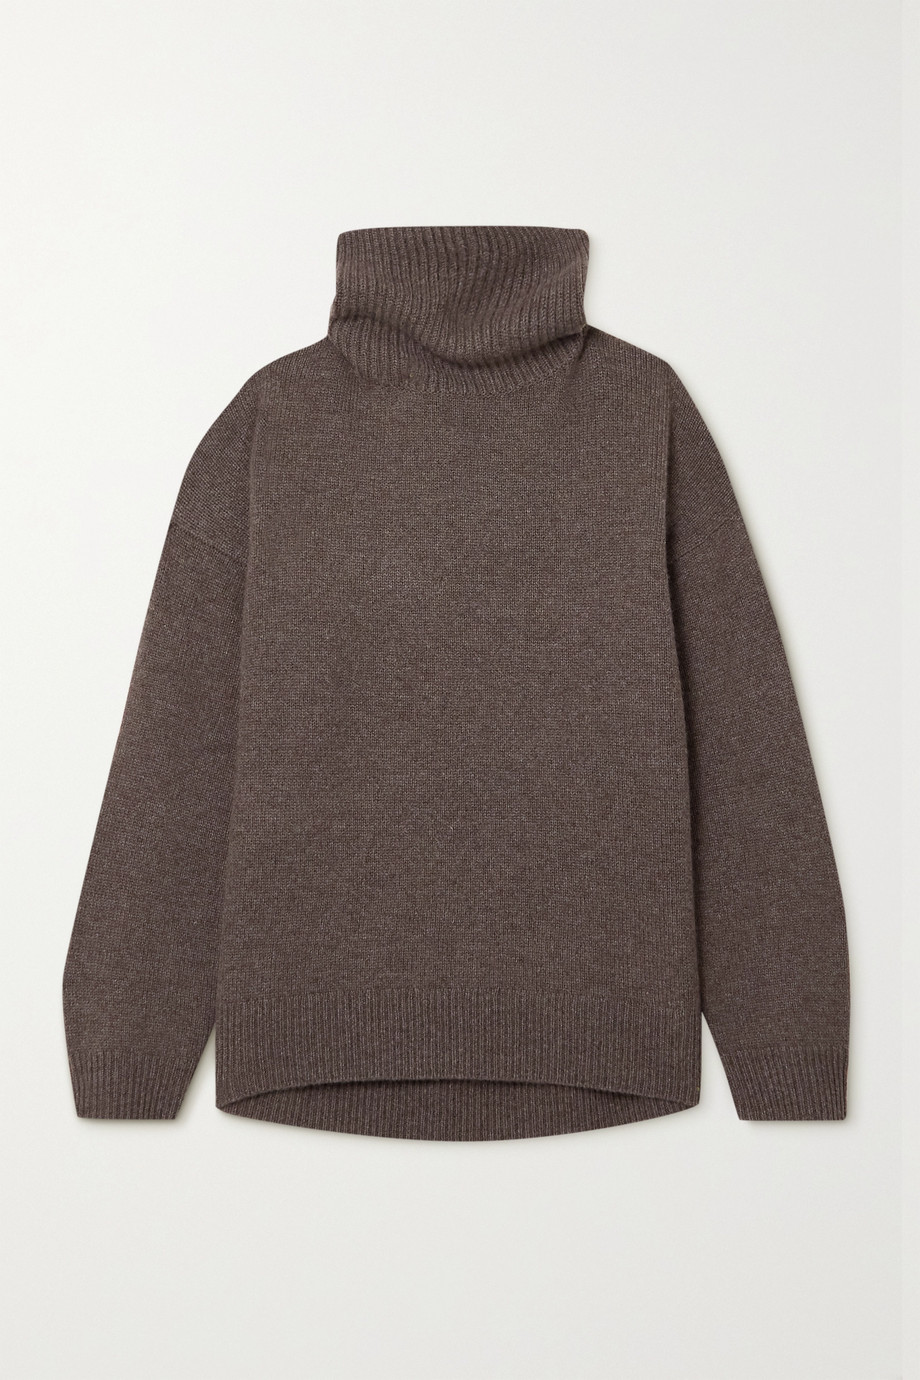 Lisa Yang Jennie cashmere turtleneck sweater